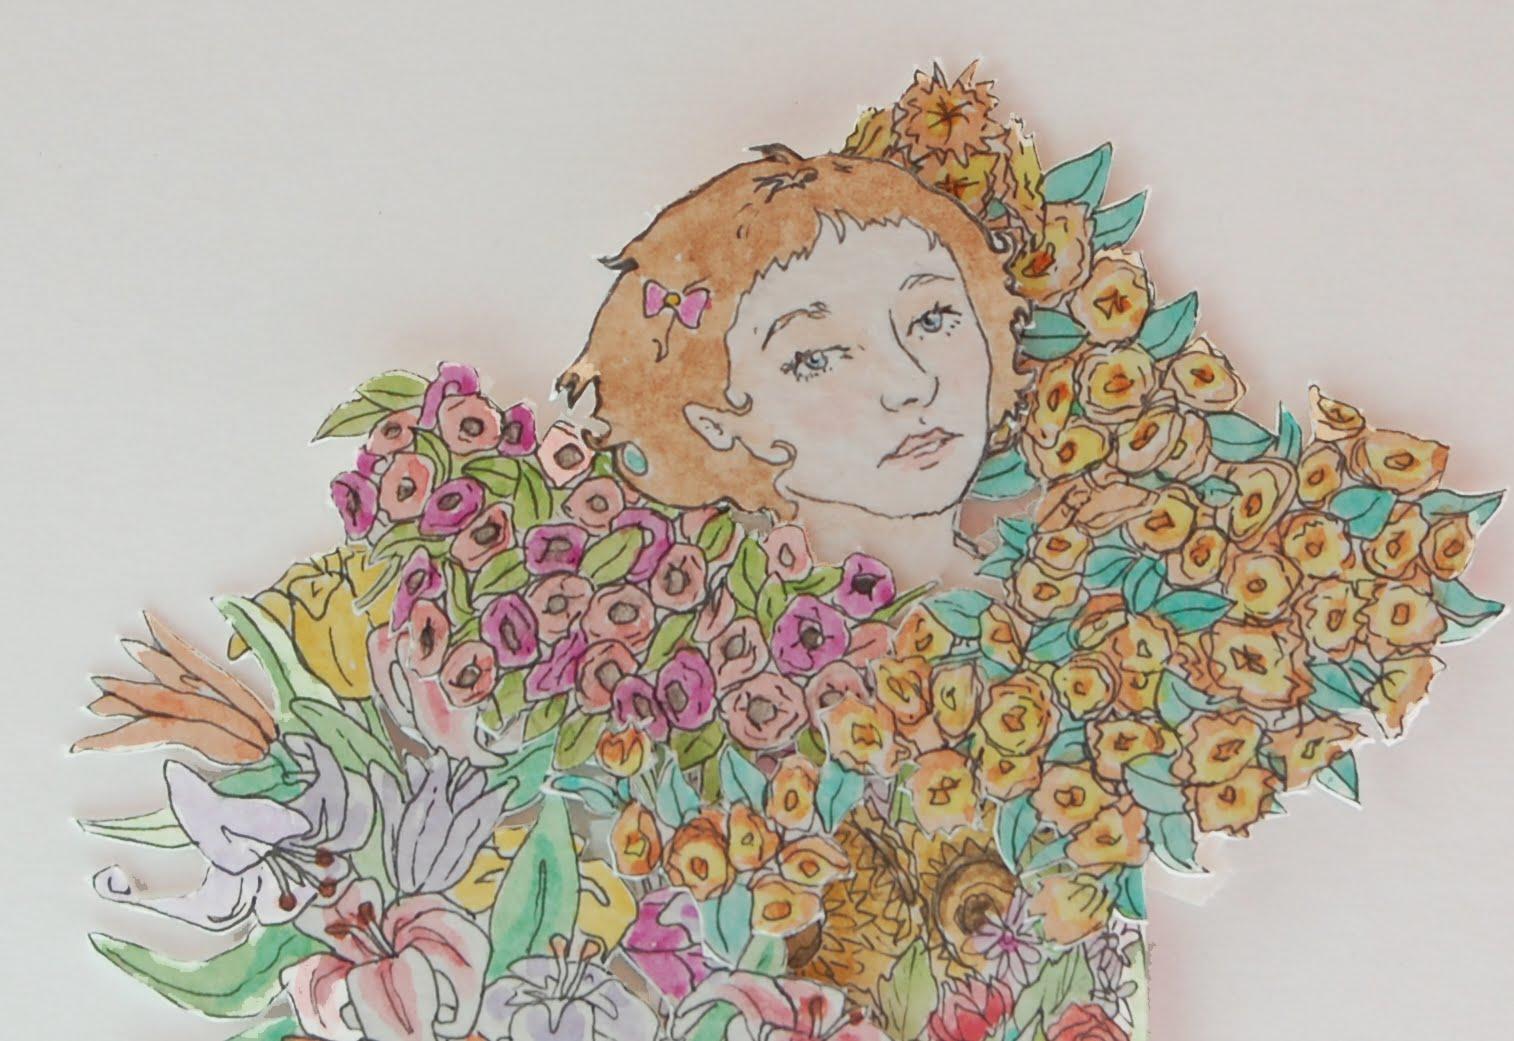 http://4.bp.blogspot.com/-rtzuhp5yzbc/TpNTwdGVxUI/AAAAAAAAAGE/6Npr6X0tUMA/s1600/FlowerGirlWIP.tif